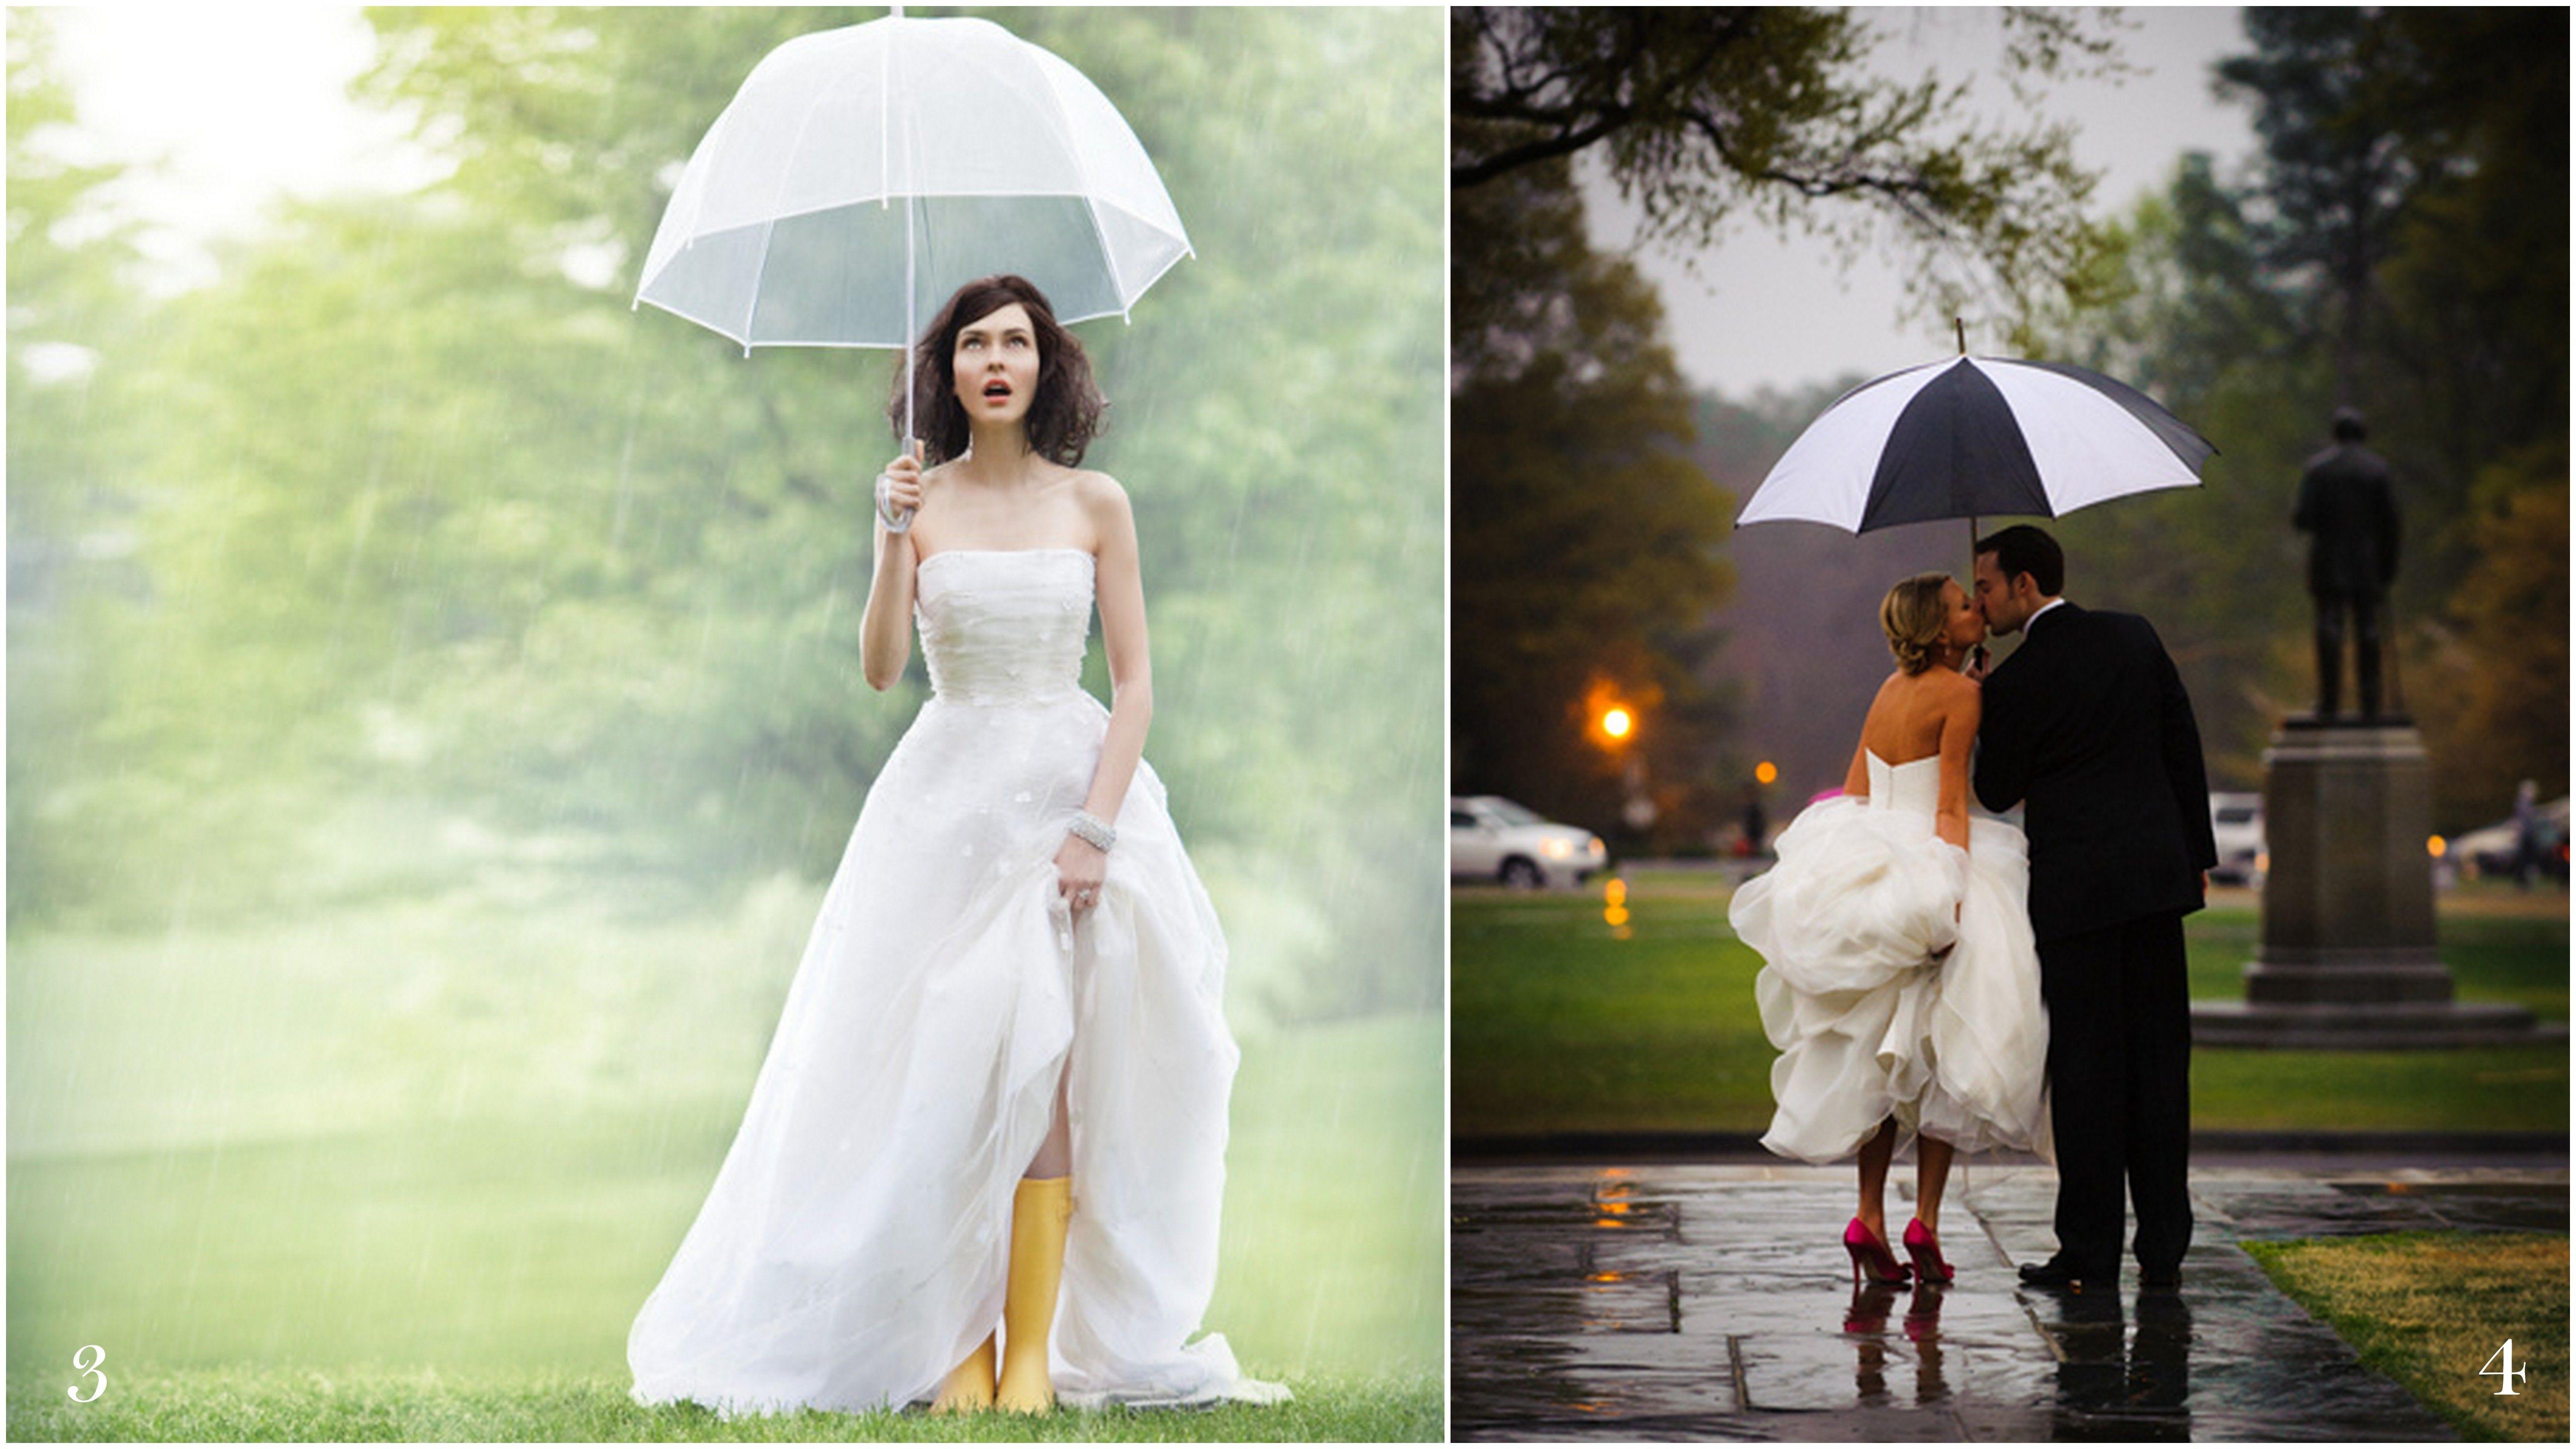 Yellow rain boot and umbrellas w e d d i n g pinterest yellow rain boot and umbrellas junglespirit Choice Image